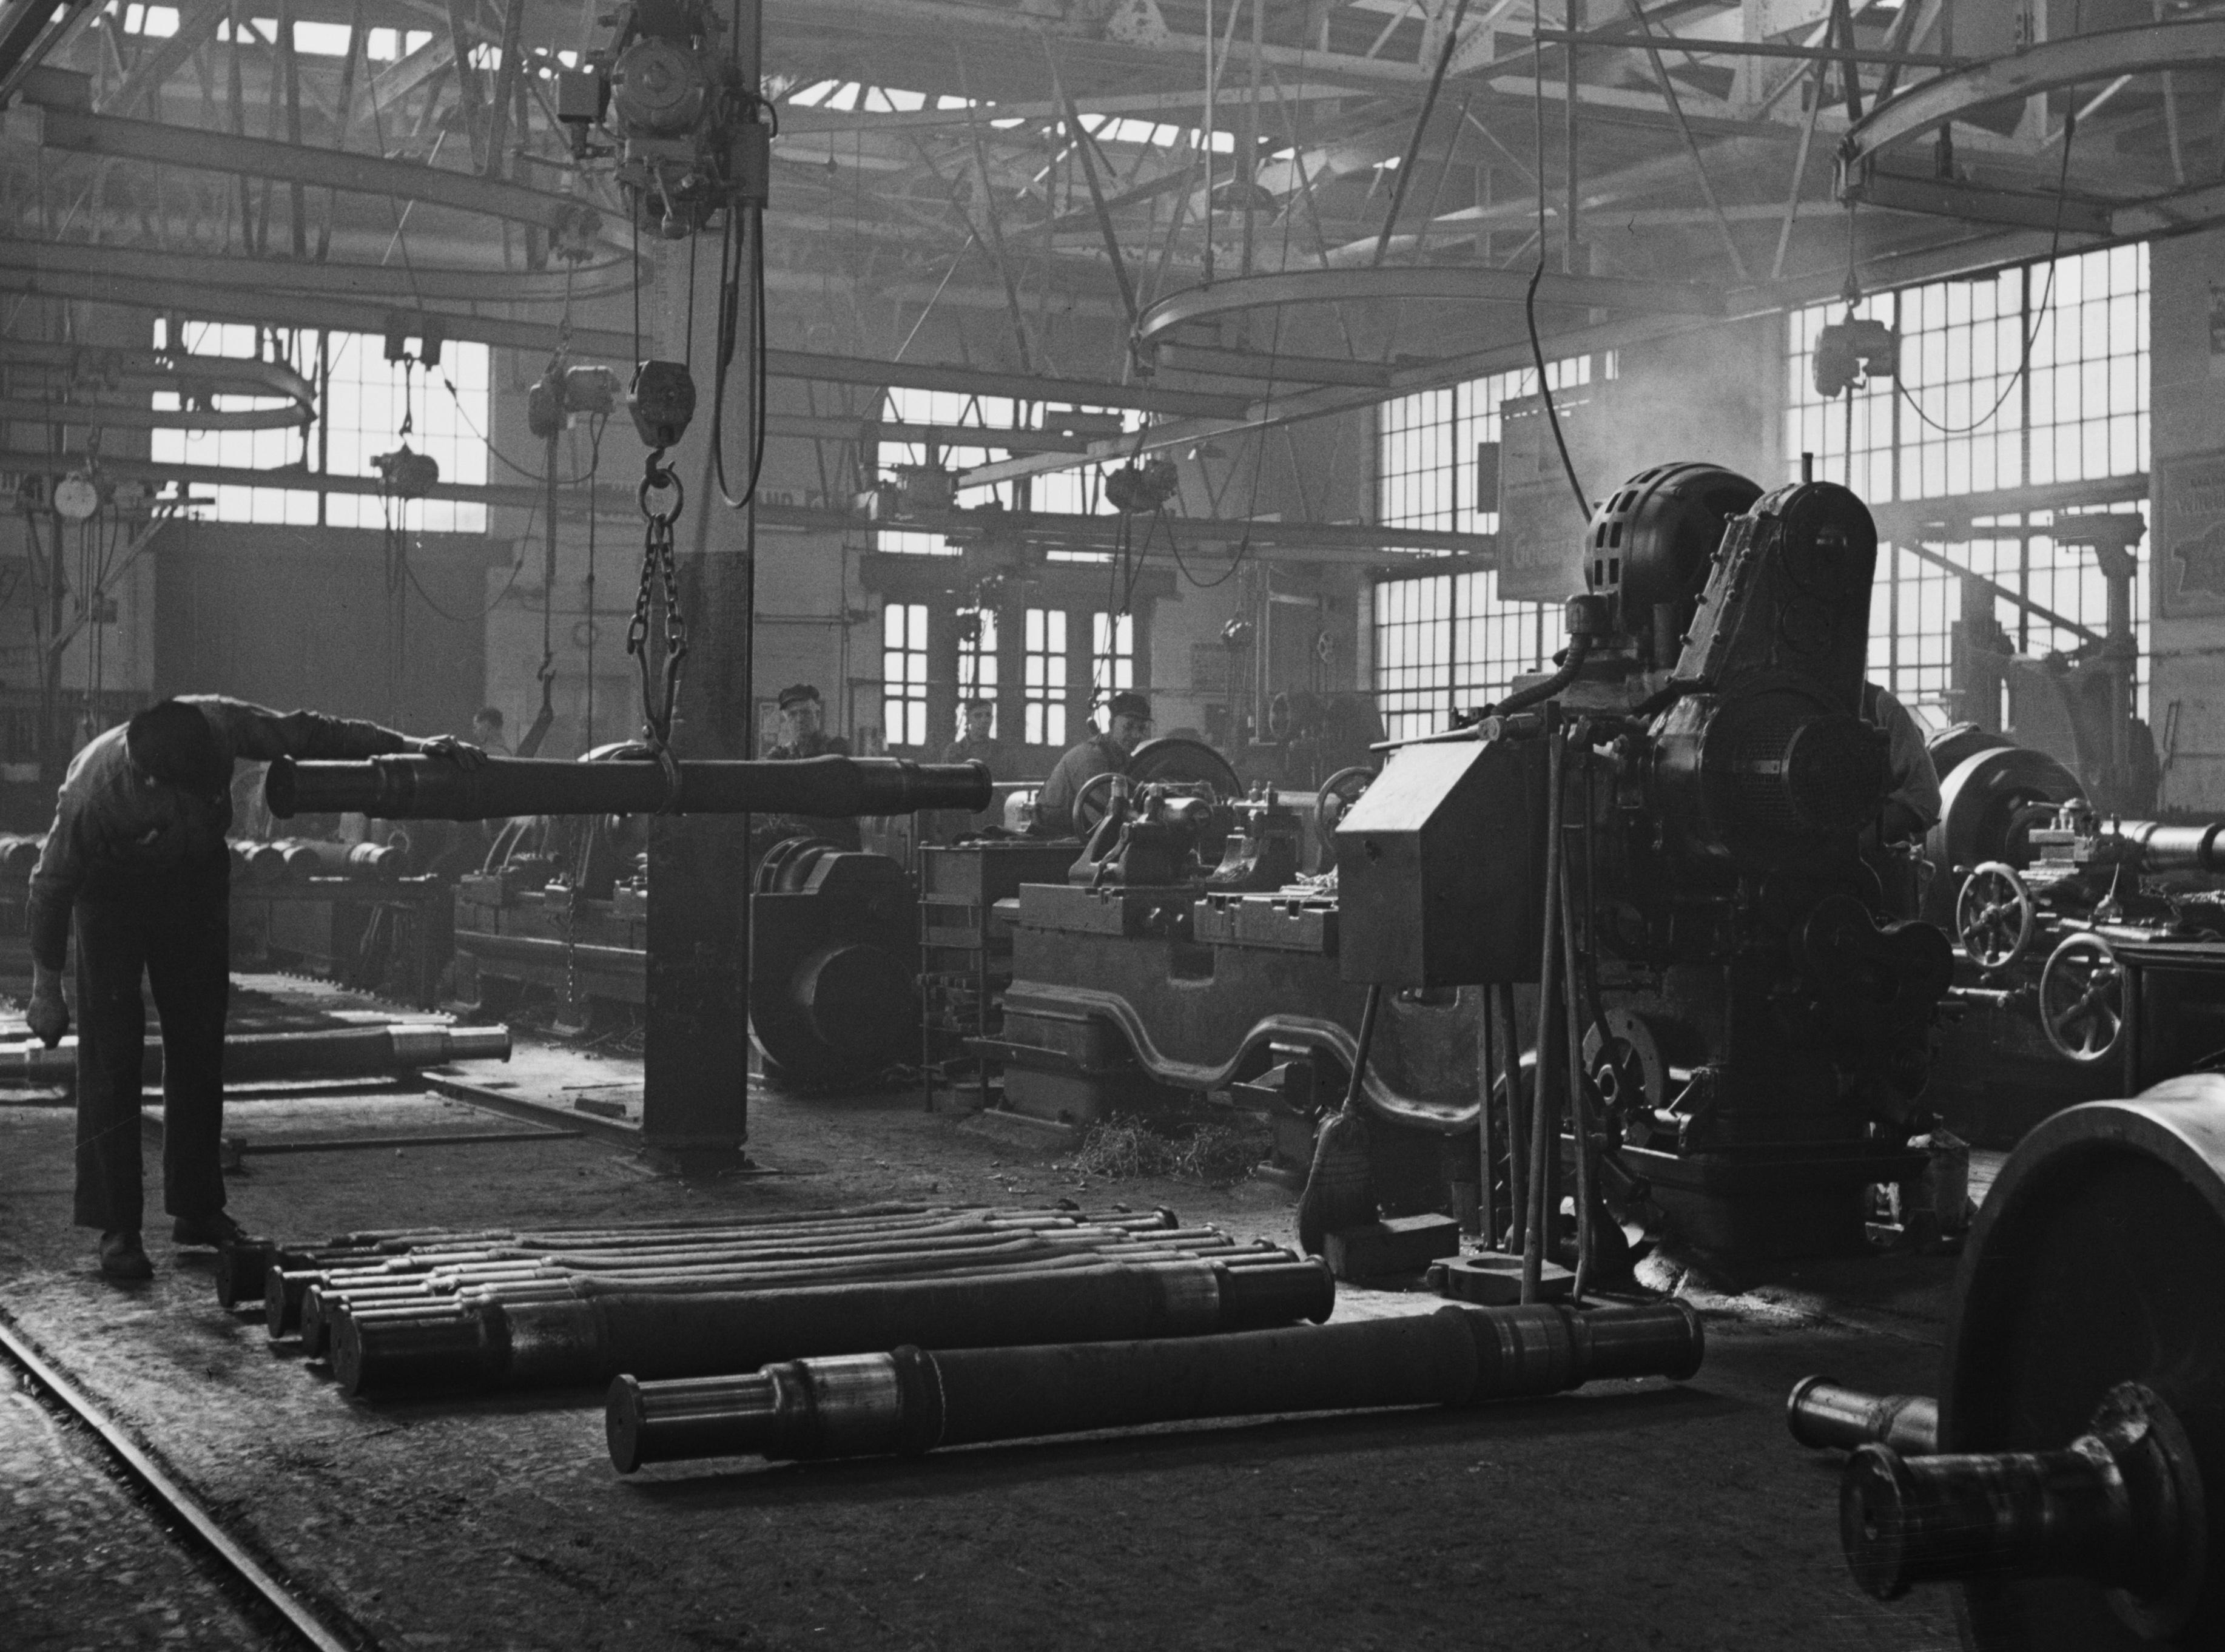 File:Railroad-Shopmen-1942.jpg - Wikipedia